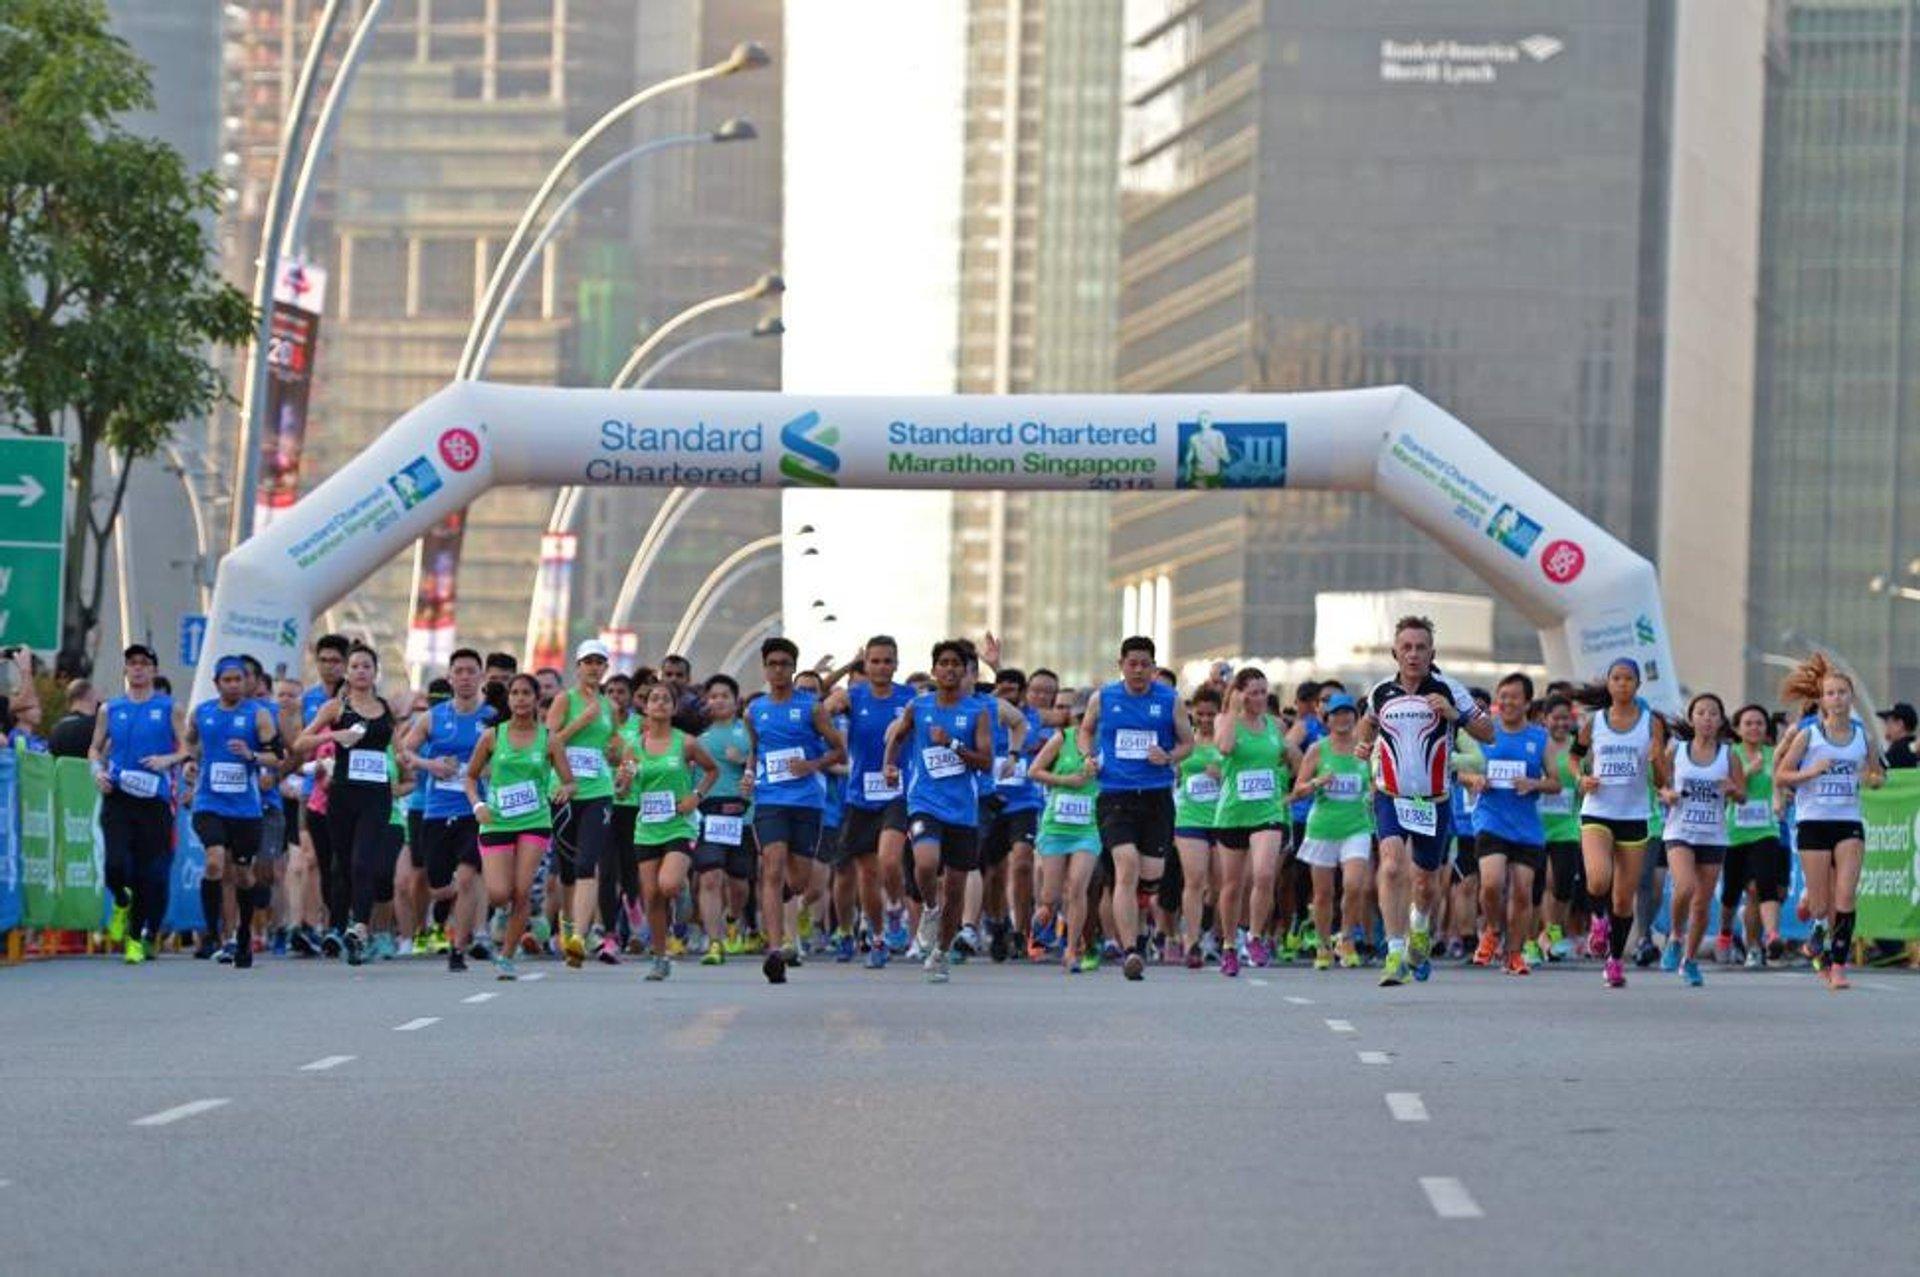 Standard Chartered Marathon Singapore in Singapore - Best Season 2020